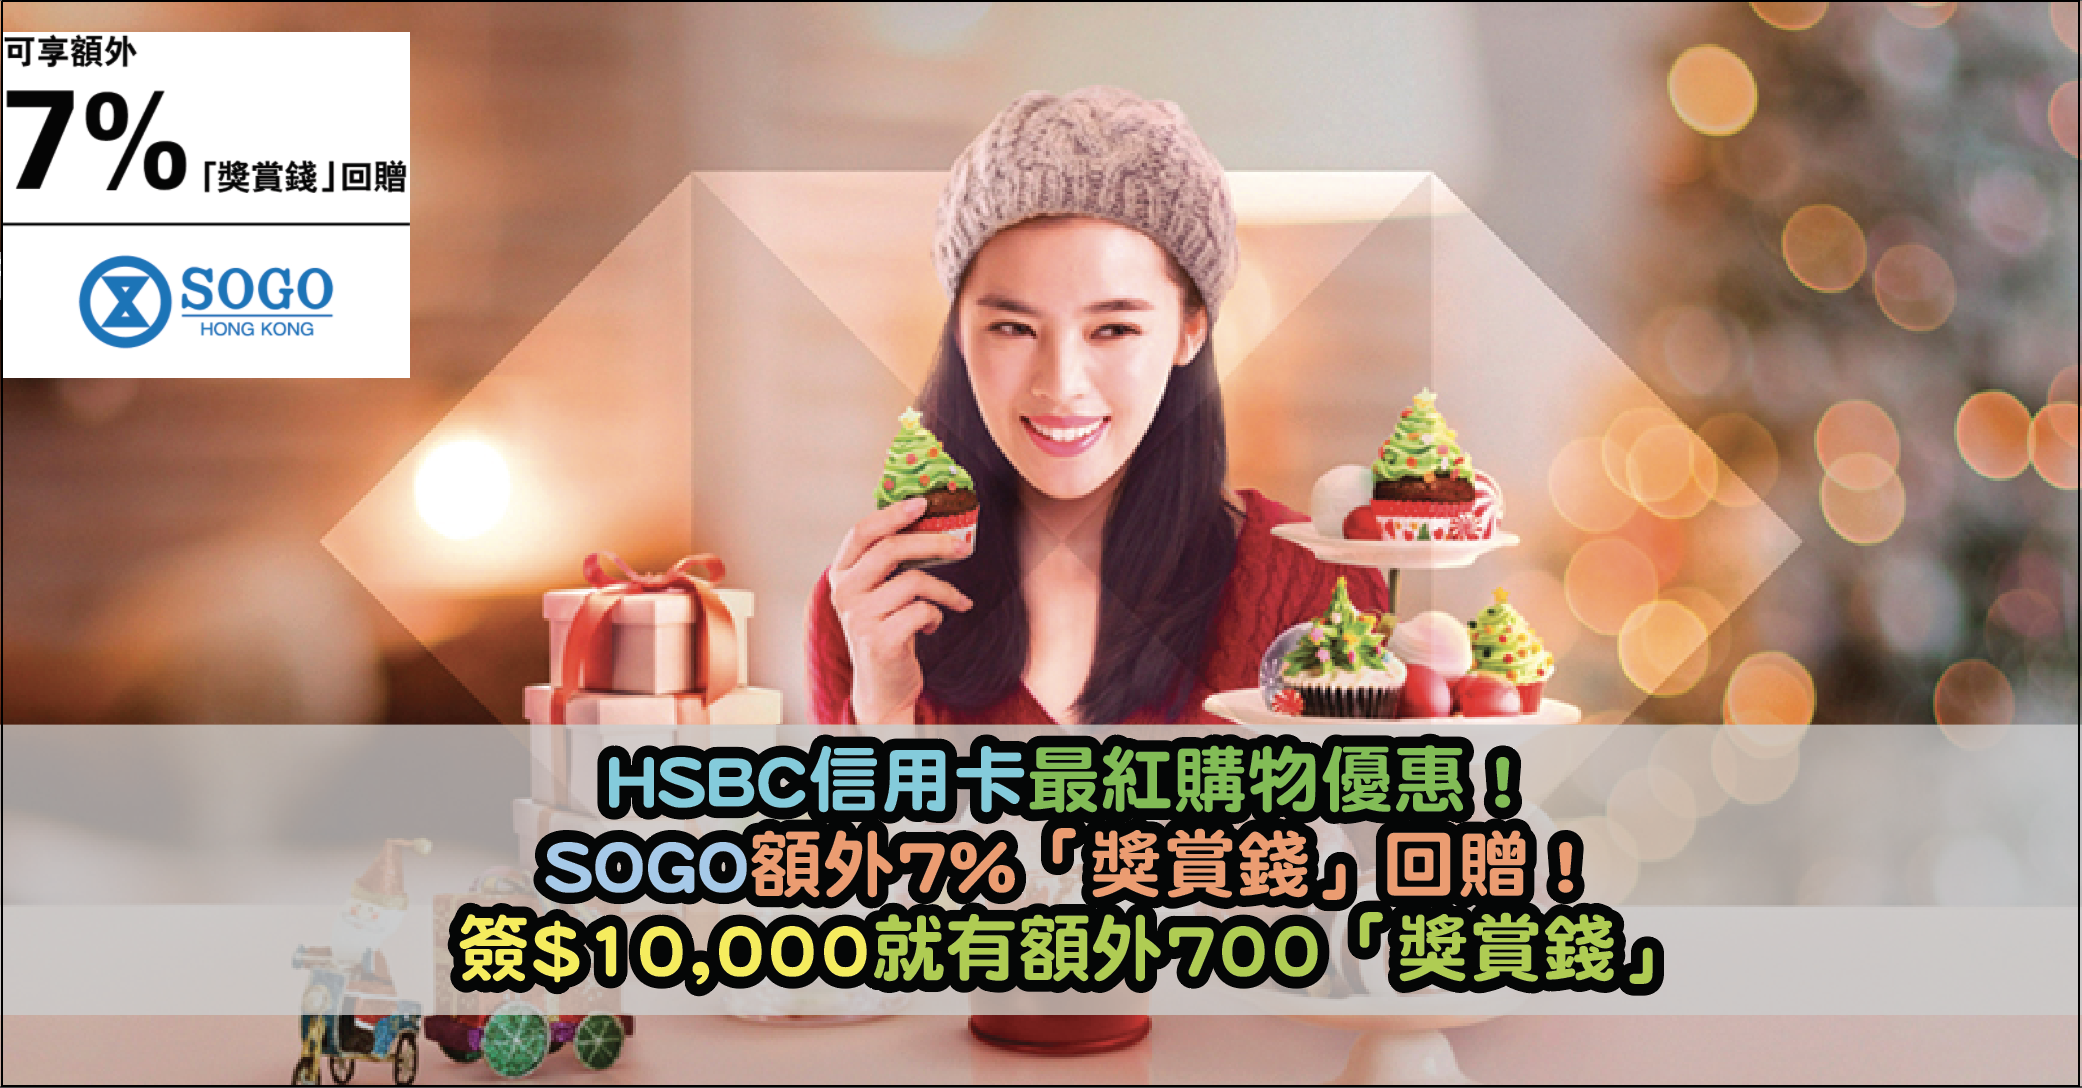 HSBC信用卡最紅購物優惠!SOGO額外7%「獎賞錢」回贈!簽$10,000就有額外700「獎賞錢」(=8,750 Asia Miles 或 10,500 Avios/Krisflyer)!連埋迎新一齊食都得!